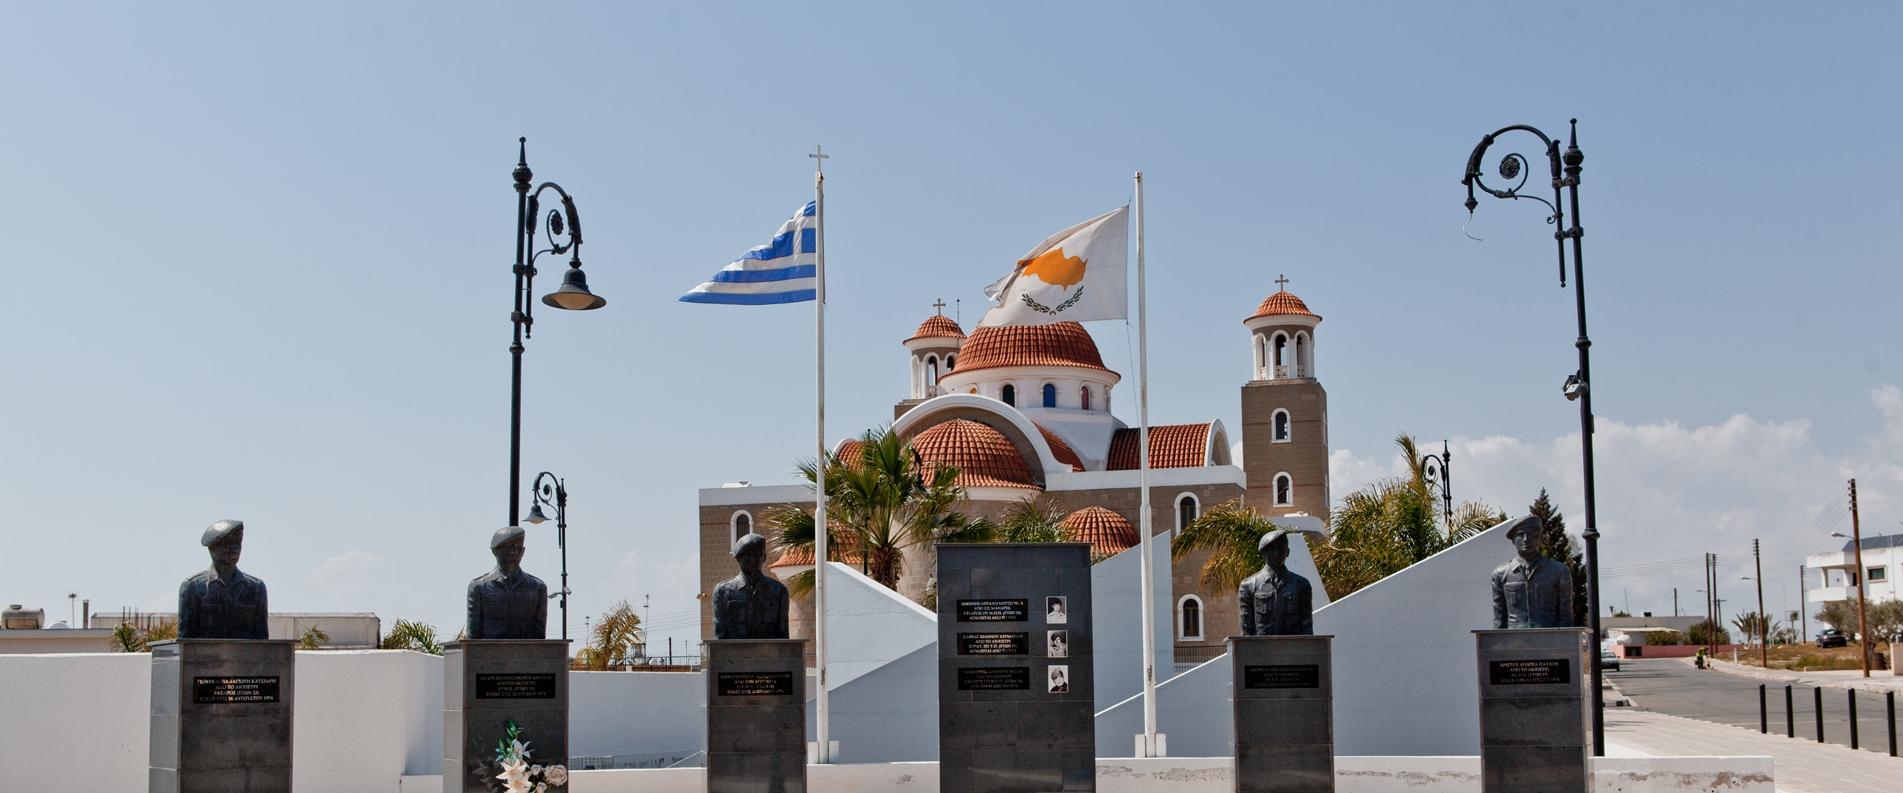 Villages near Famagusta